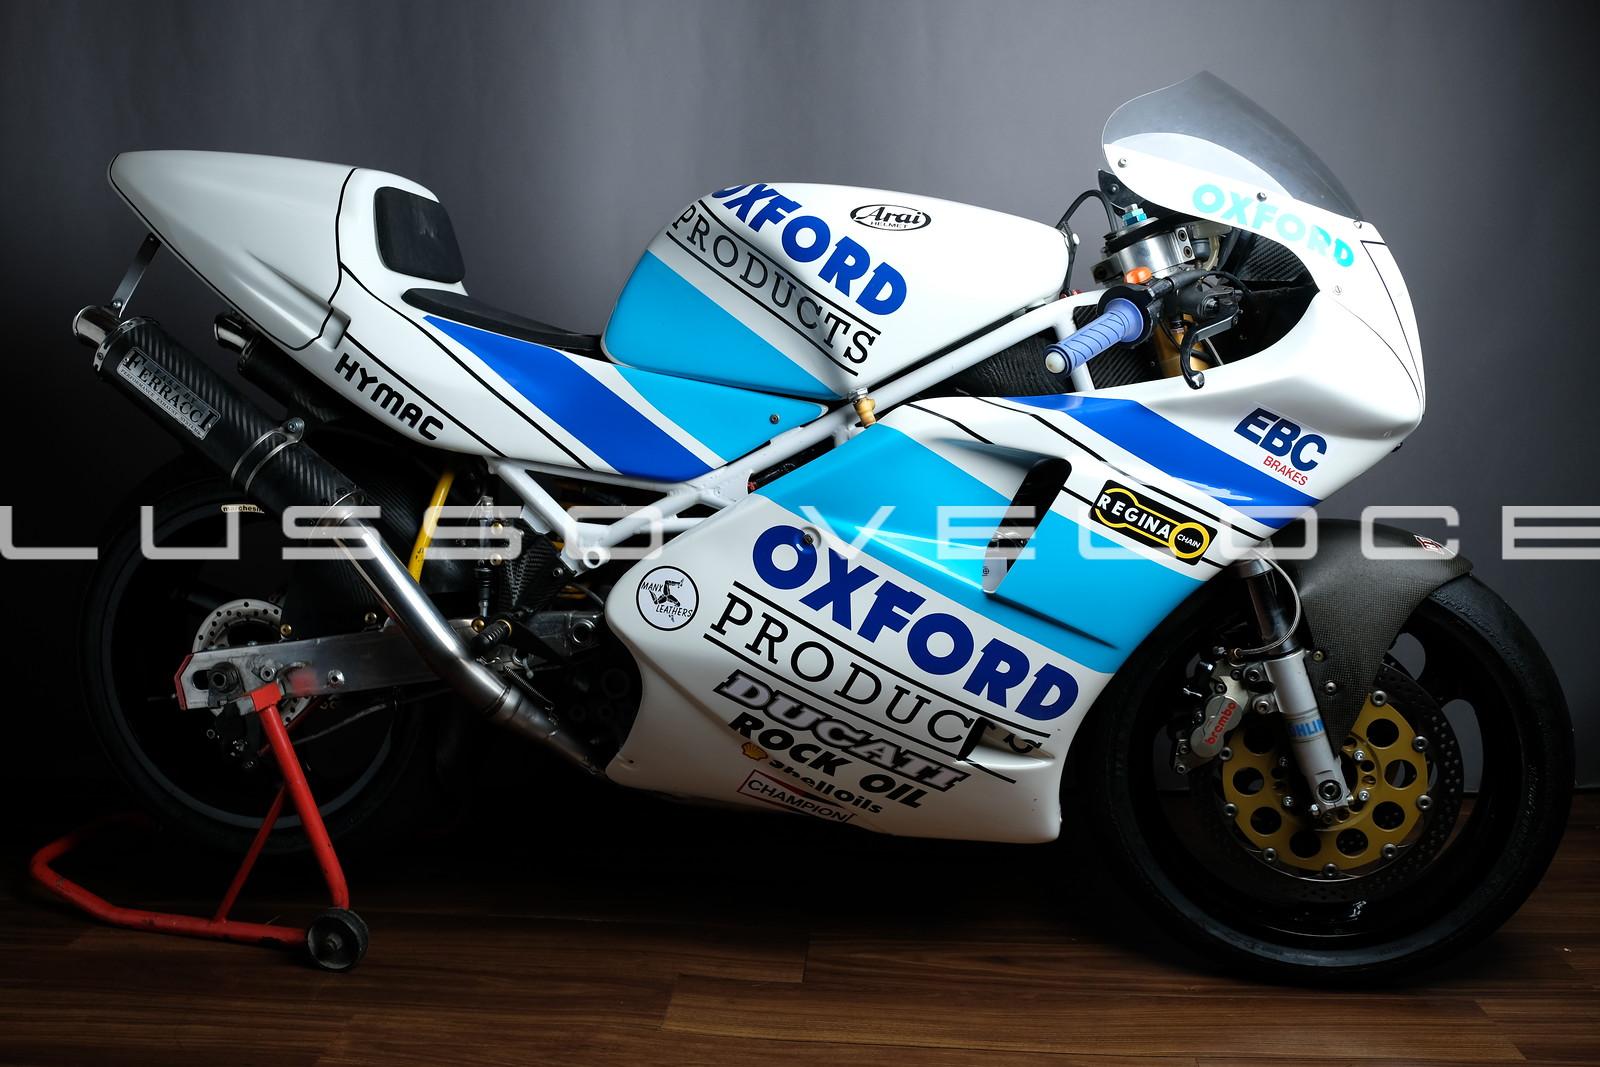 Ducati 888 Corse Ex Hizzy, Nation, Dunlop, Stringer!